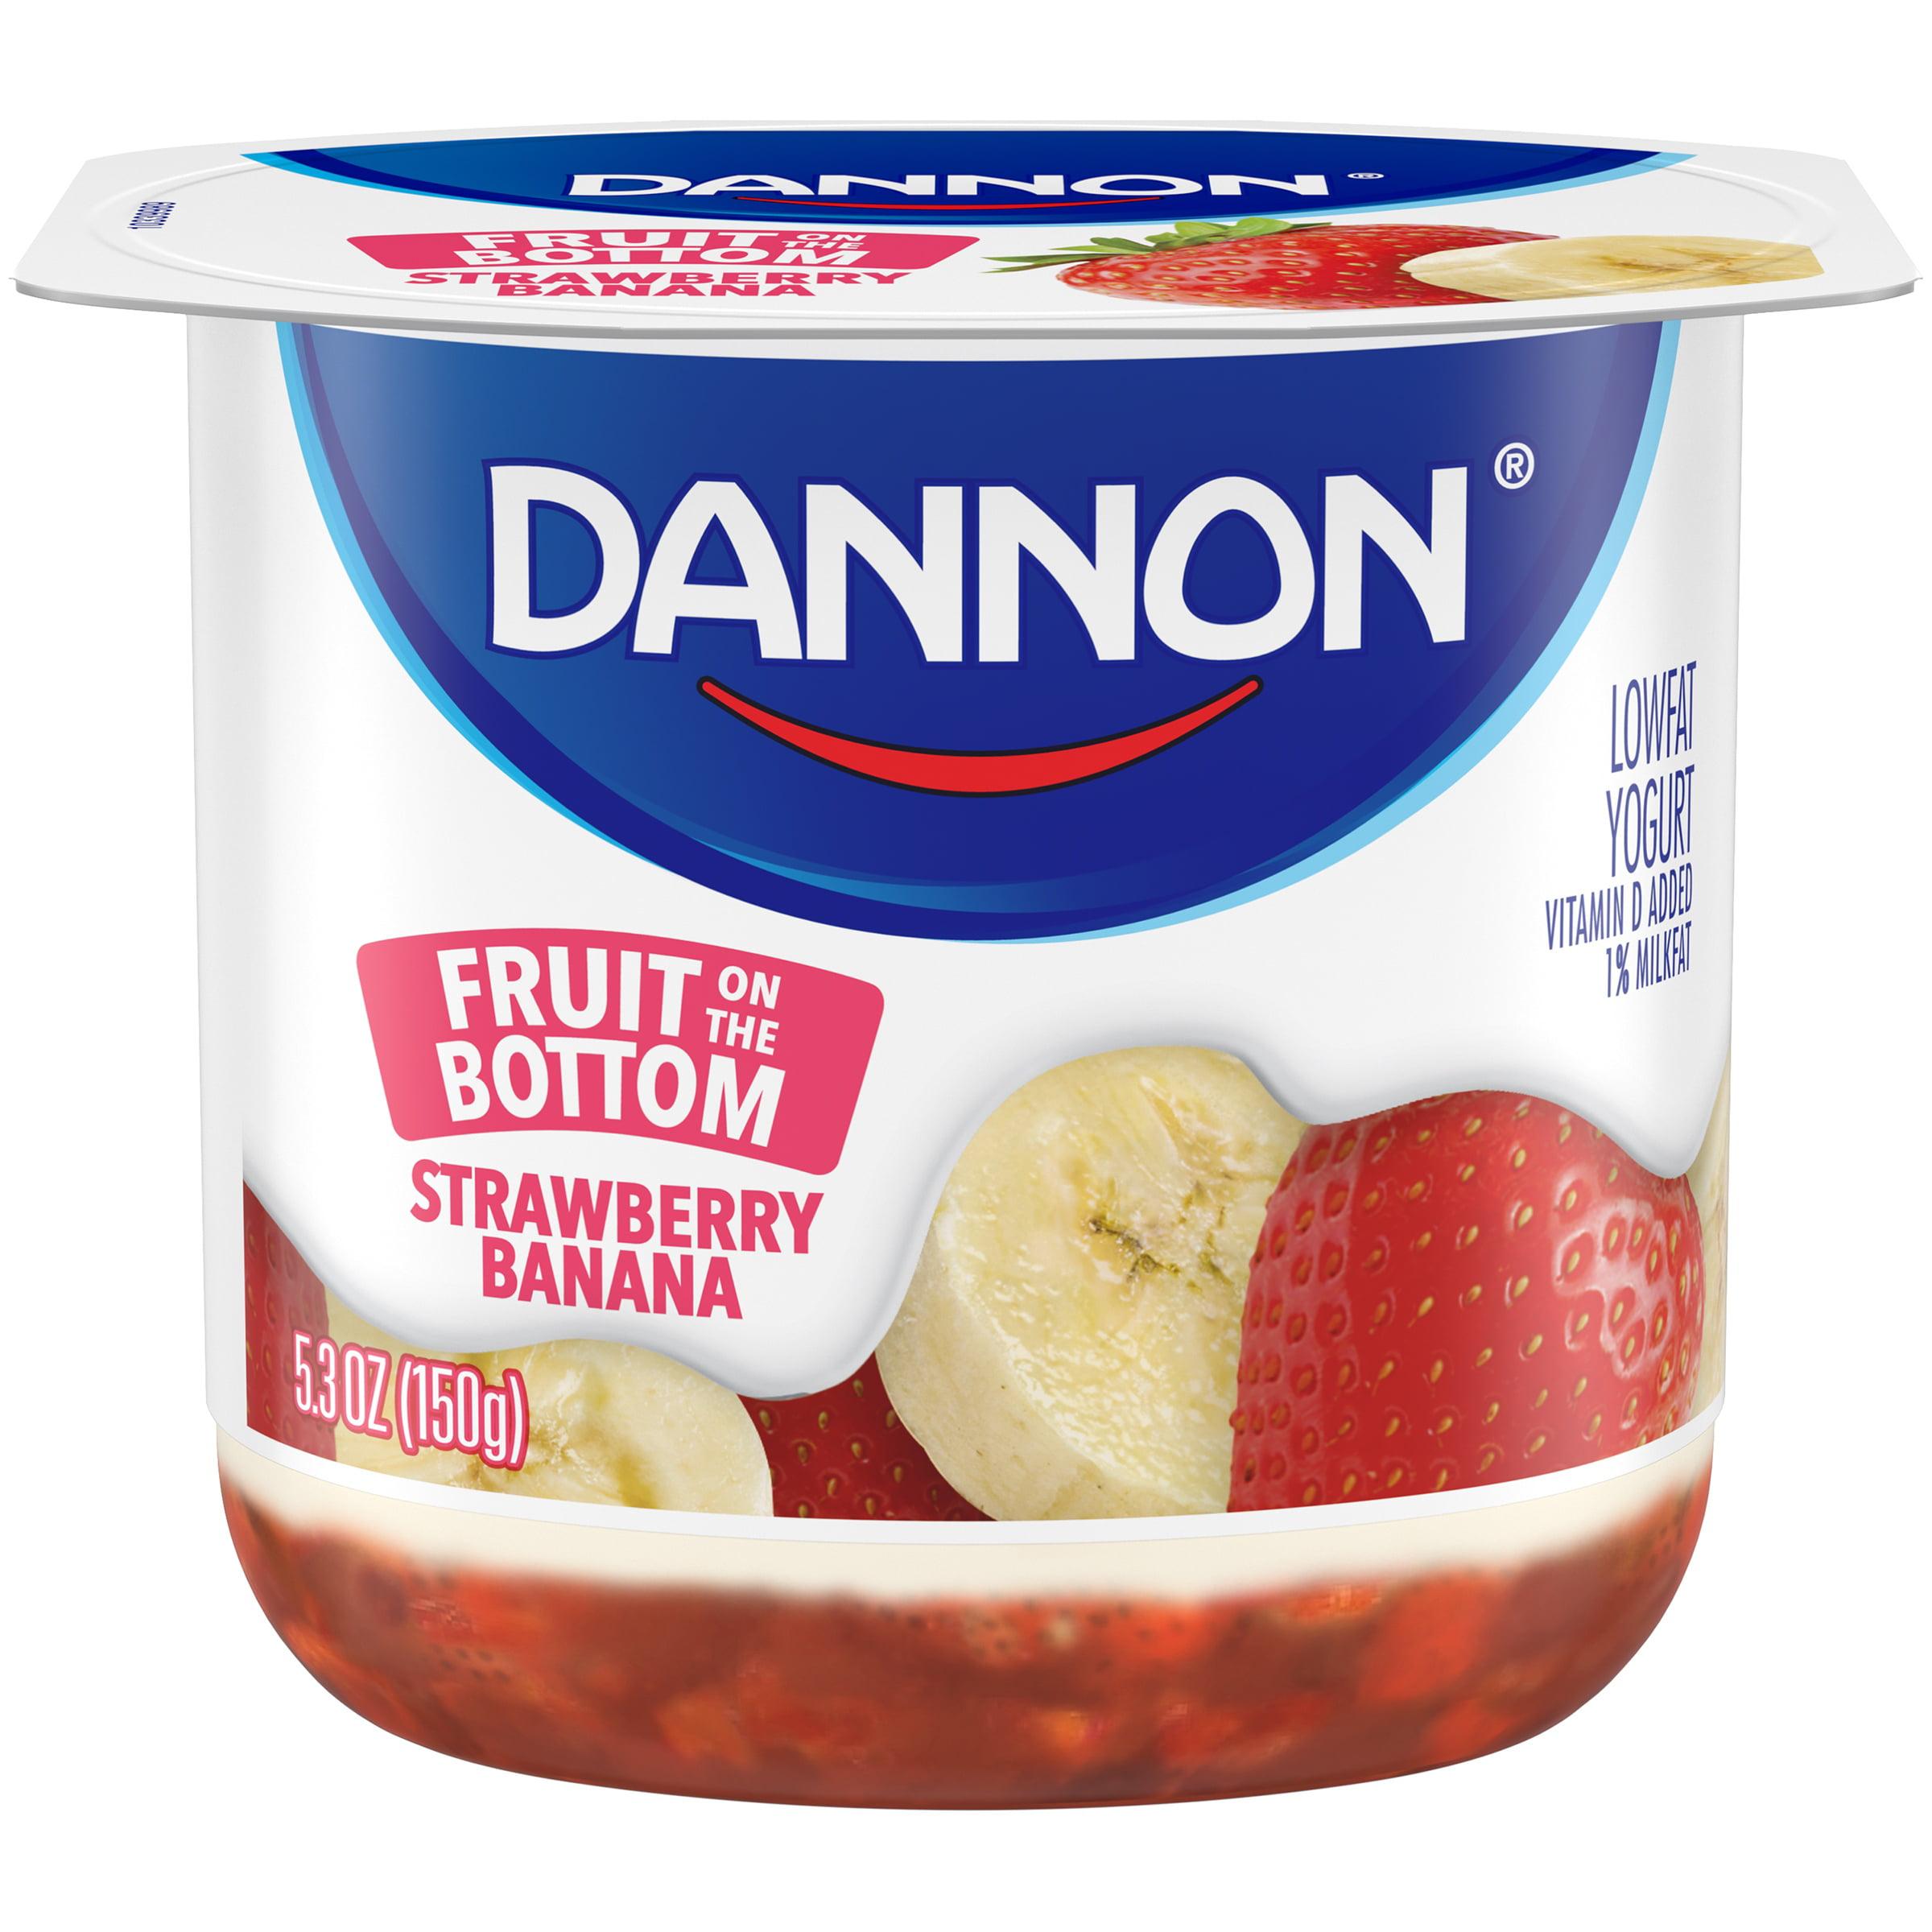 Brand Dannon® Fruit on the Bottom Lowfat Yogurt Strawberry Banana 5.3 oz. Single Serve